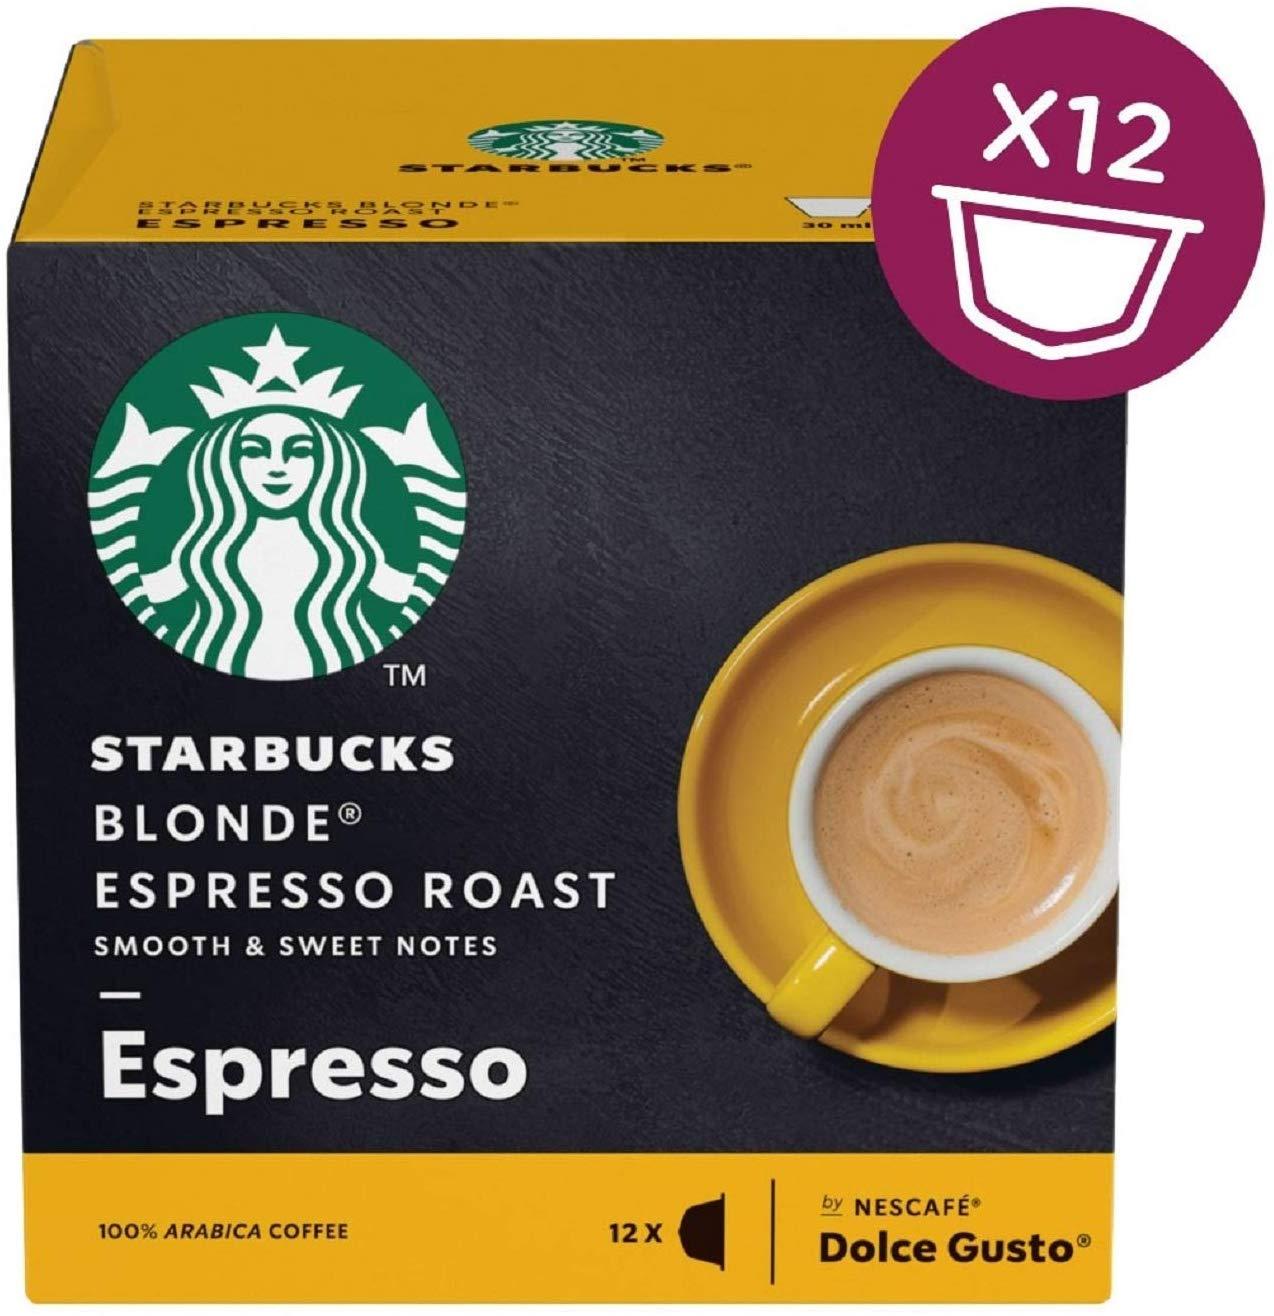 STARBUCKS Espresso Blonde PK3